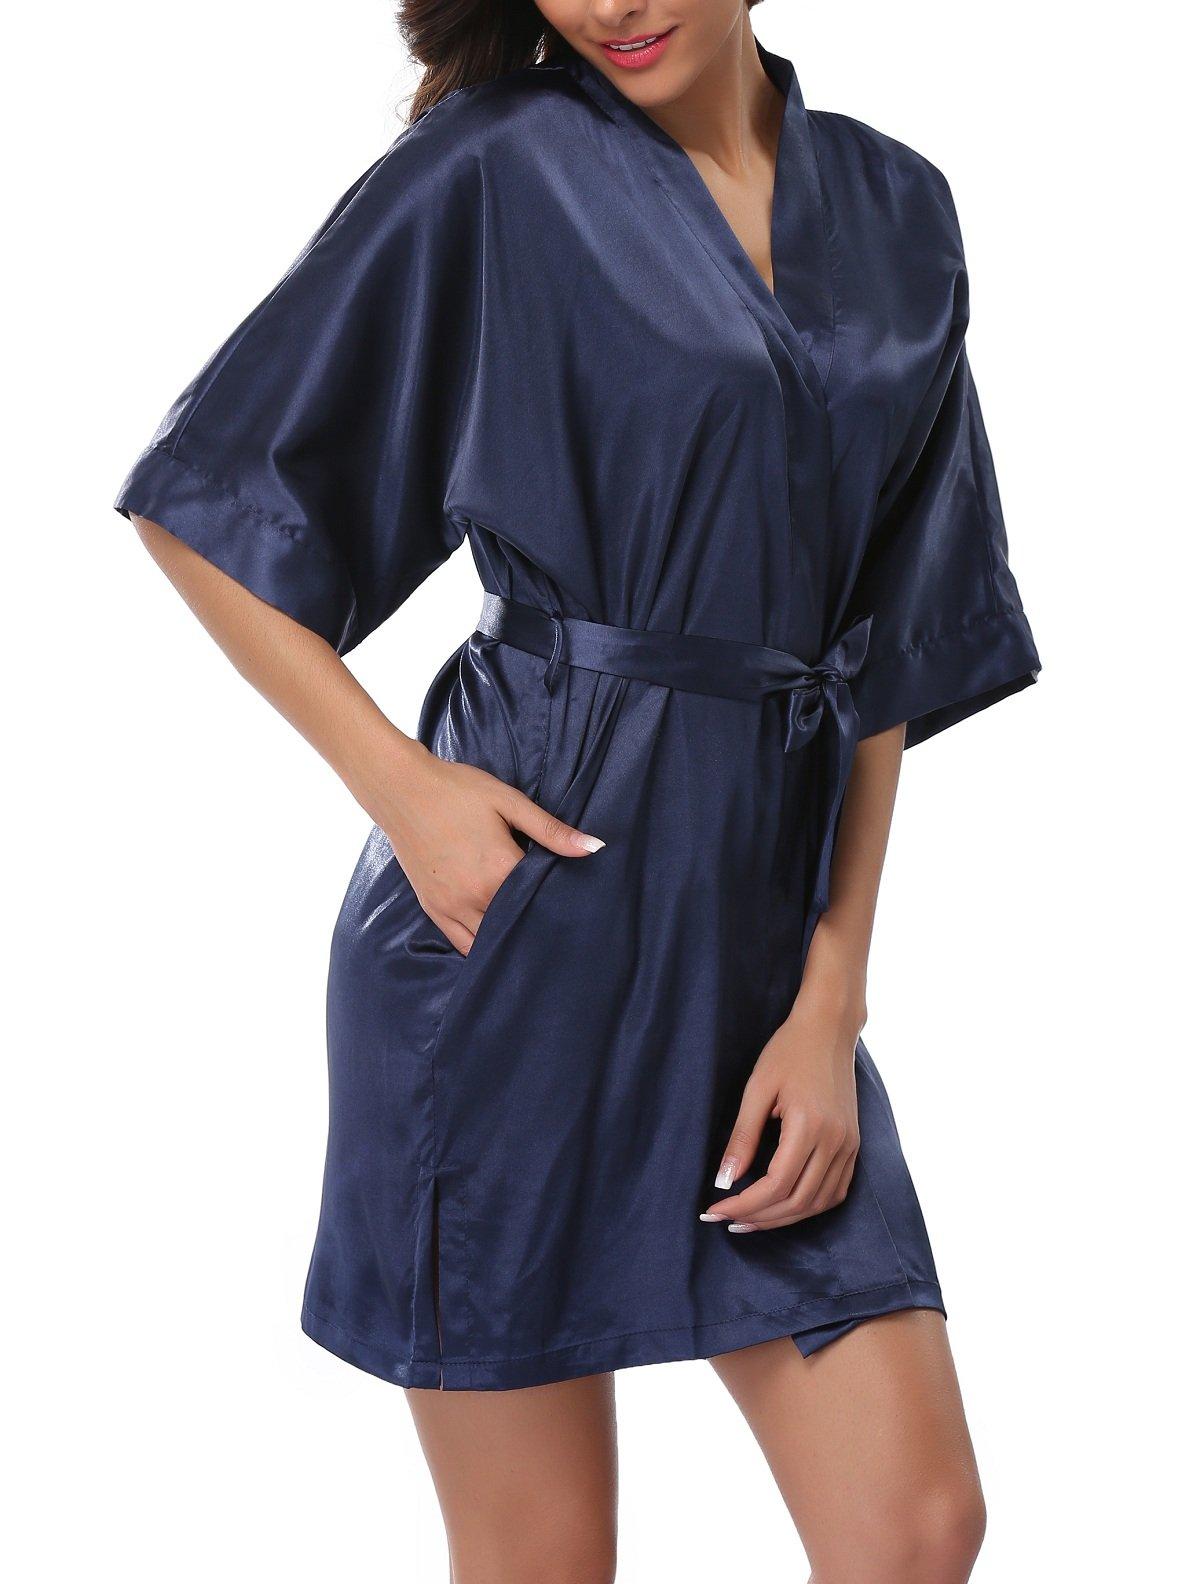 FADSHOW Women's Pure Color V Neck Kimono Robes Soft Bathrobes,Navy,Medium